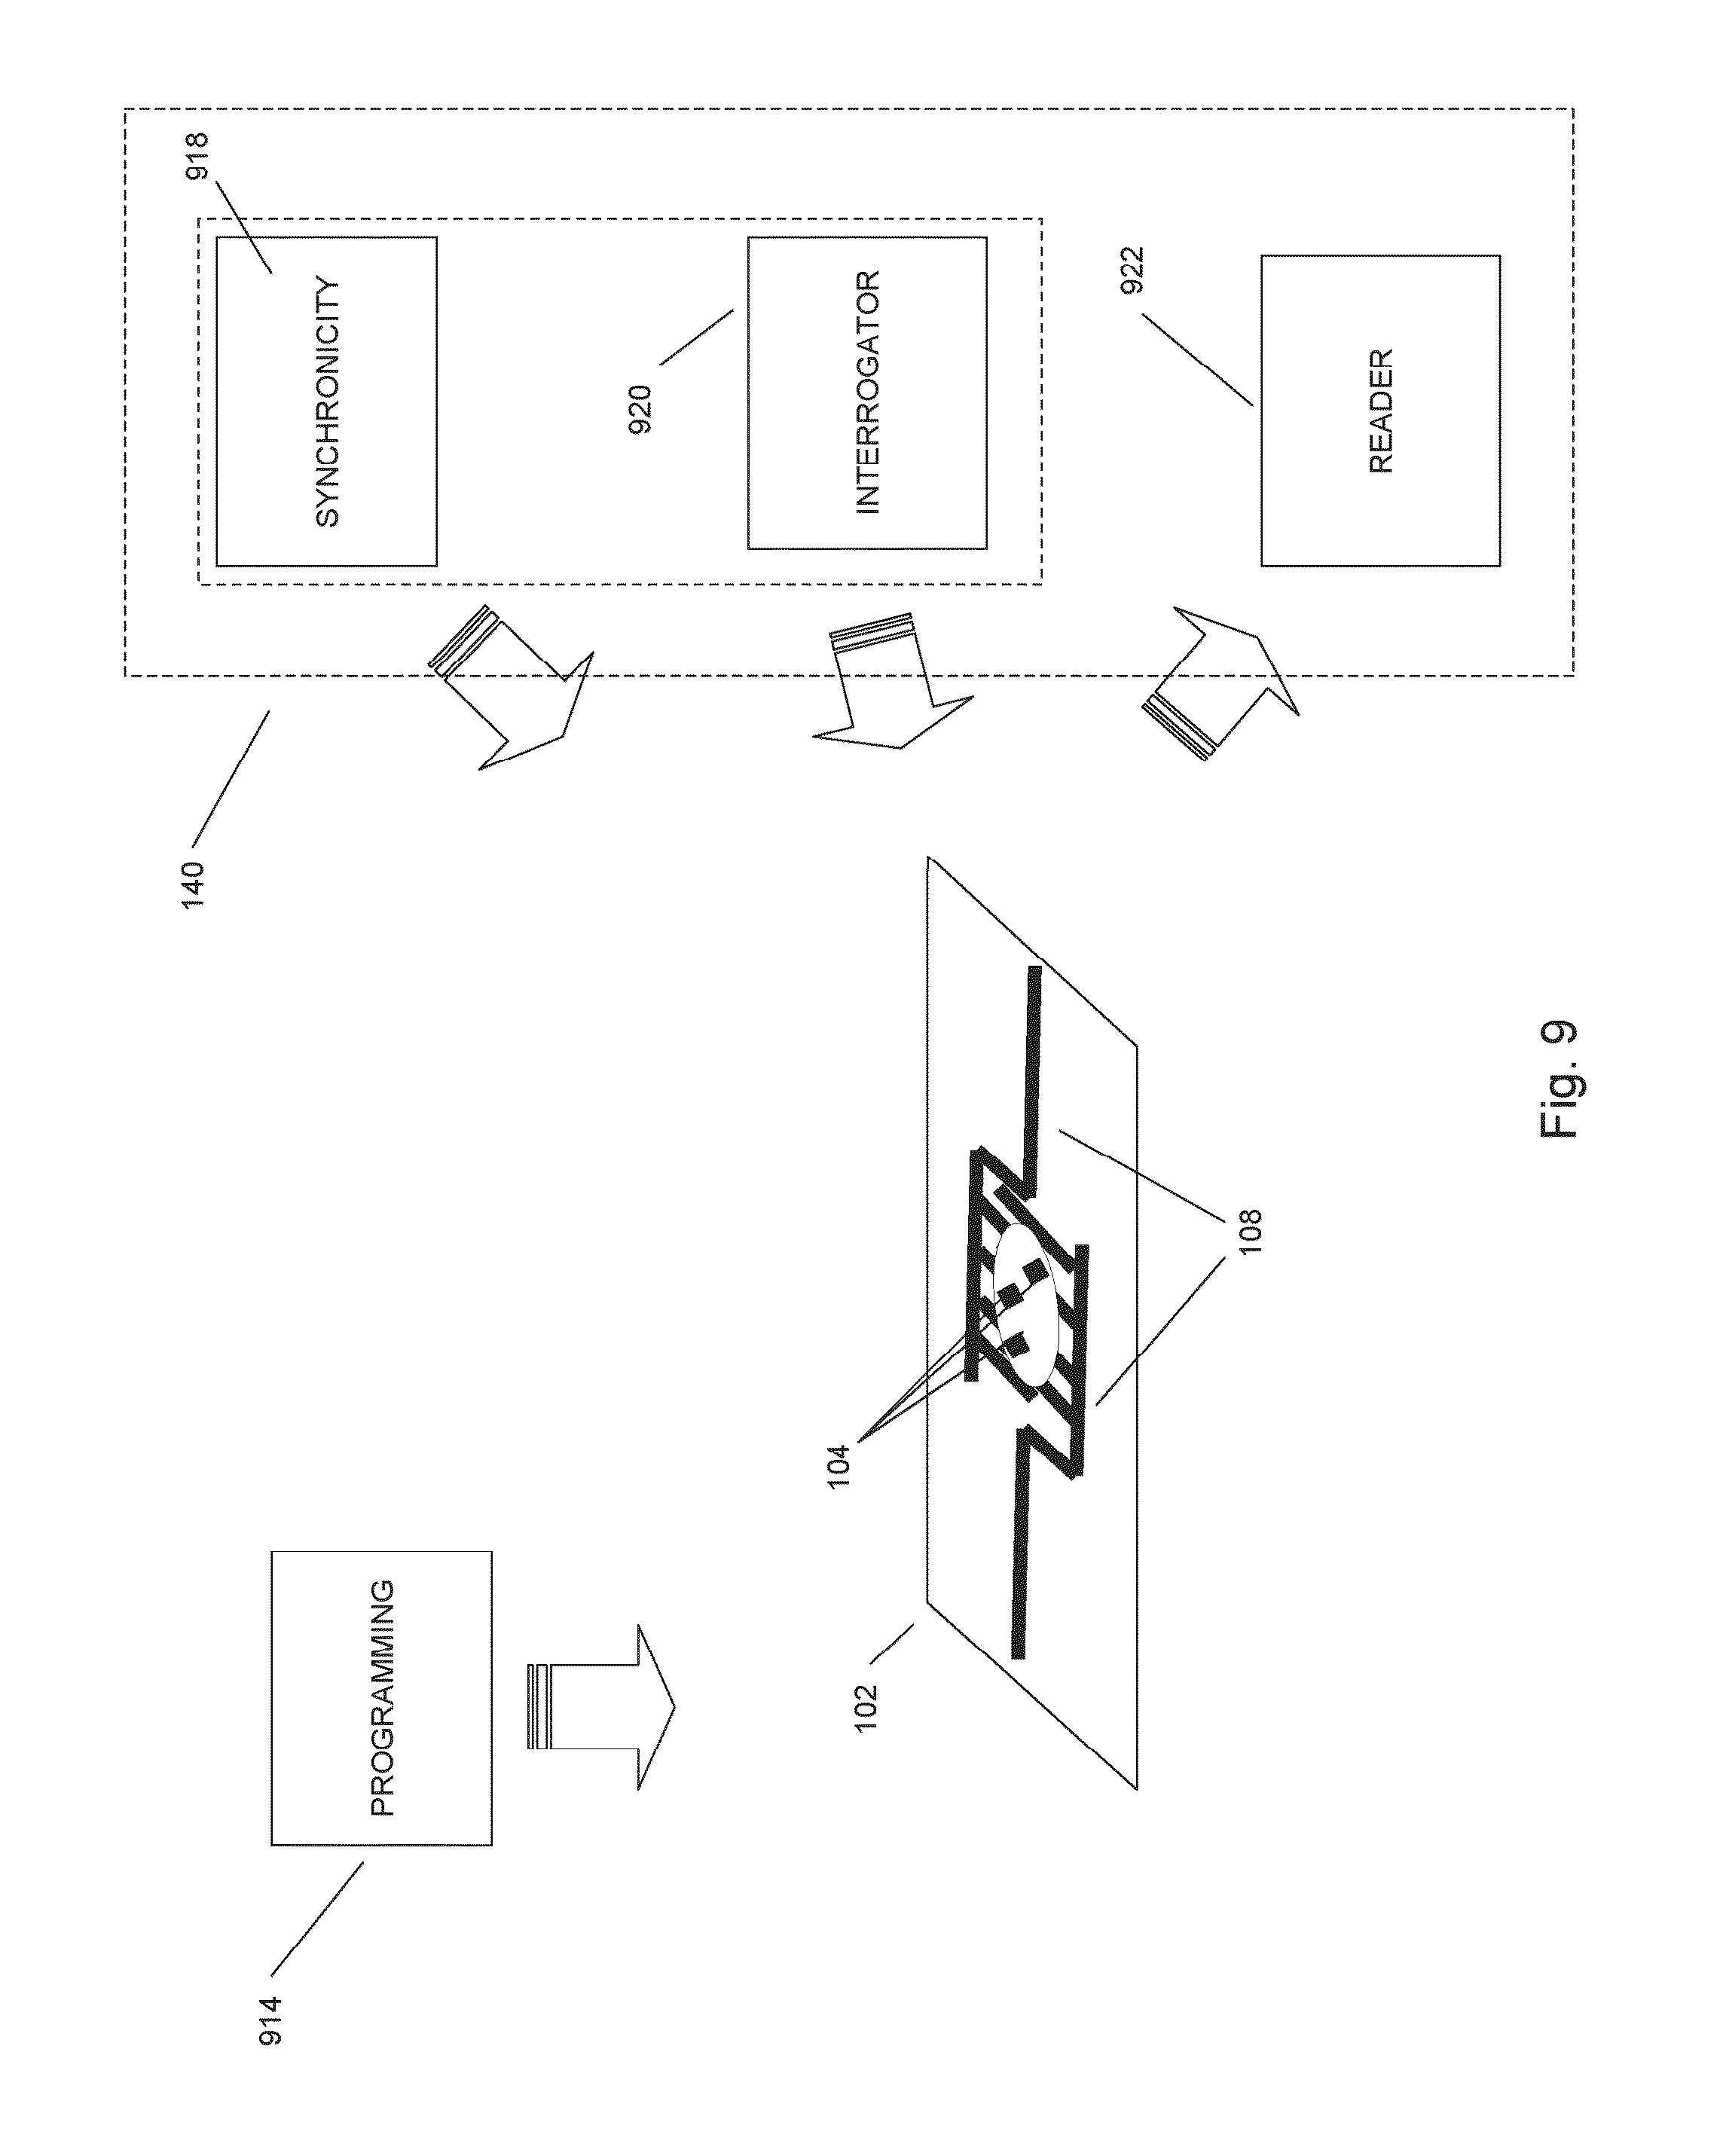 patent us 9 361 568 b2 Commercial Fire Sprinkler System Design patent